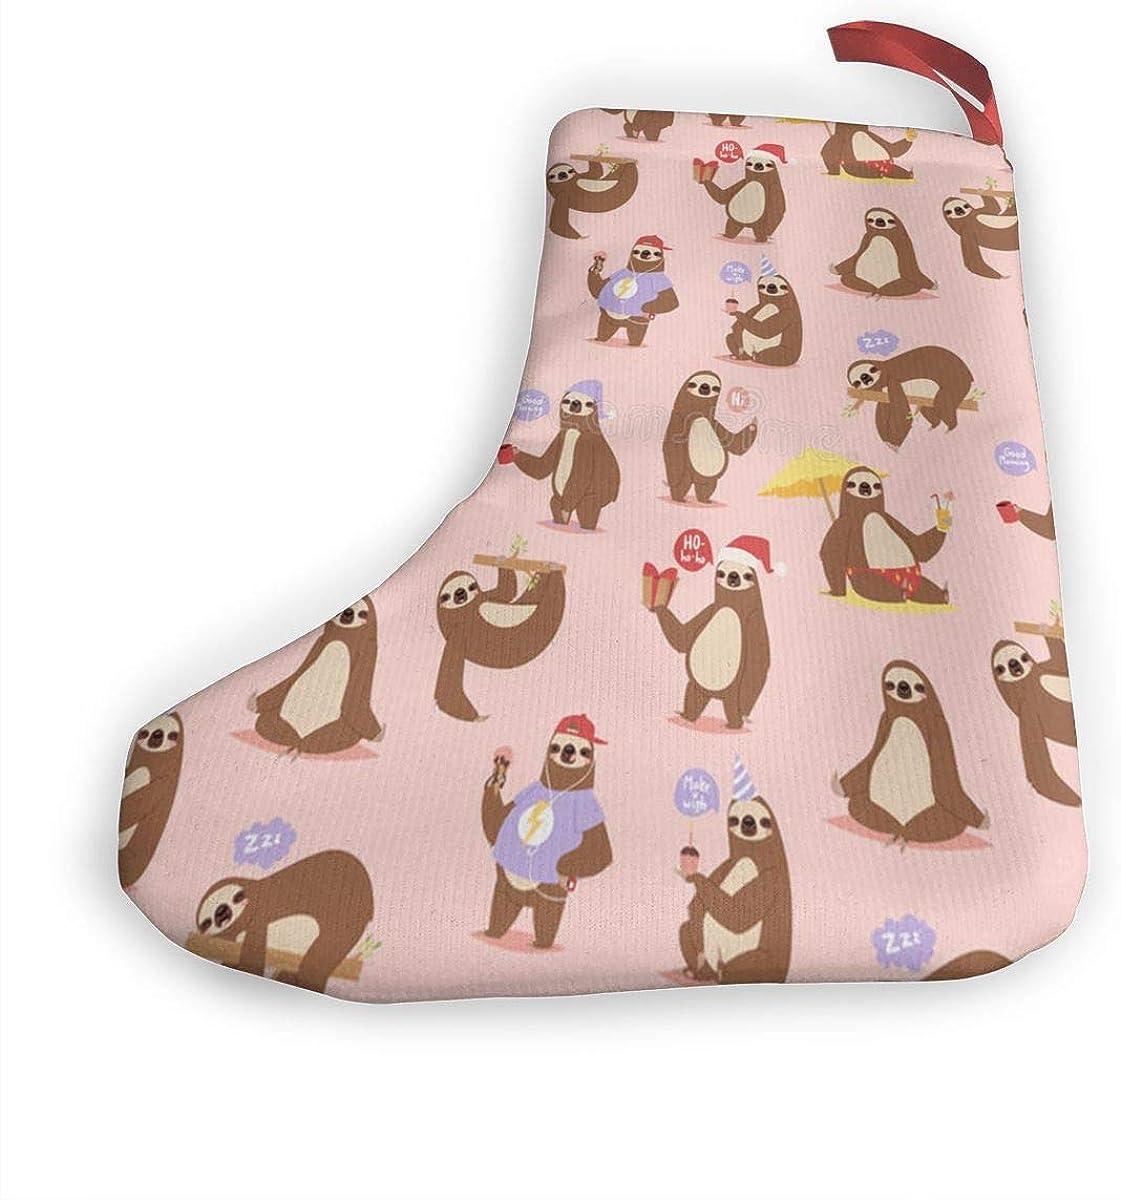 Christmas Tree Ornament Stockings Sloth Vacation Santa Xmas Socks 2Pcs Set